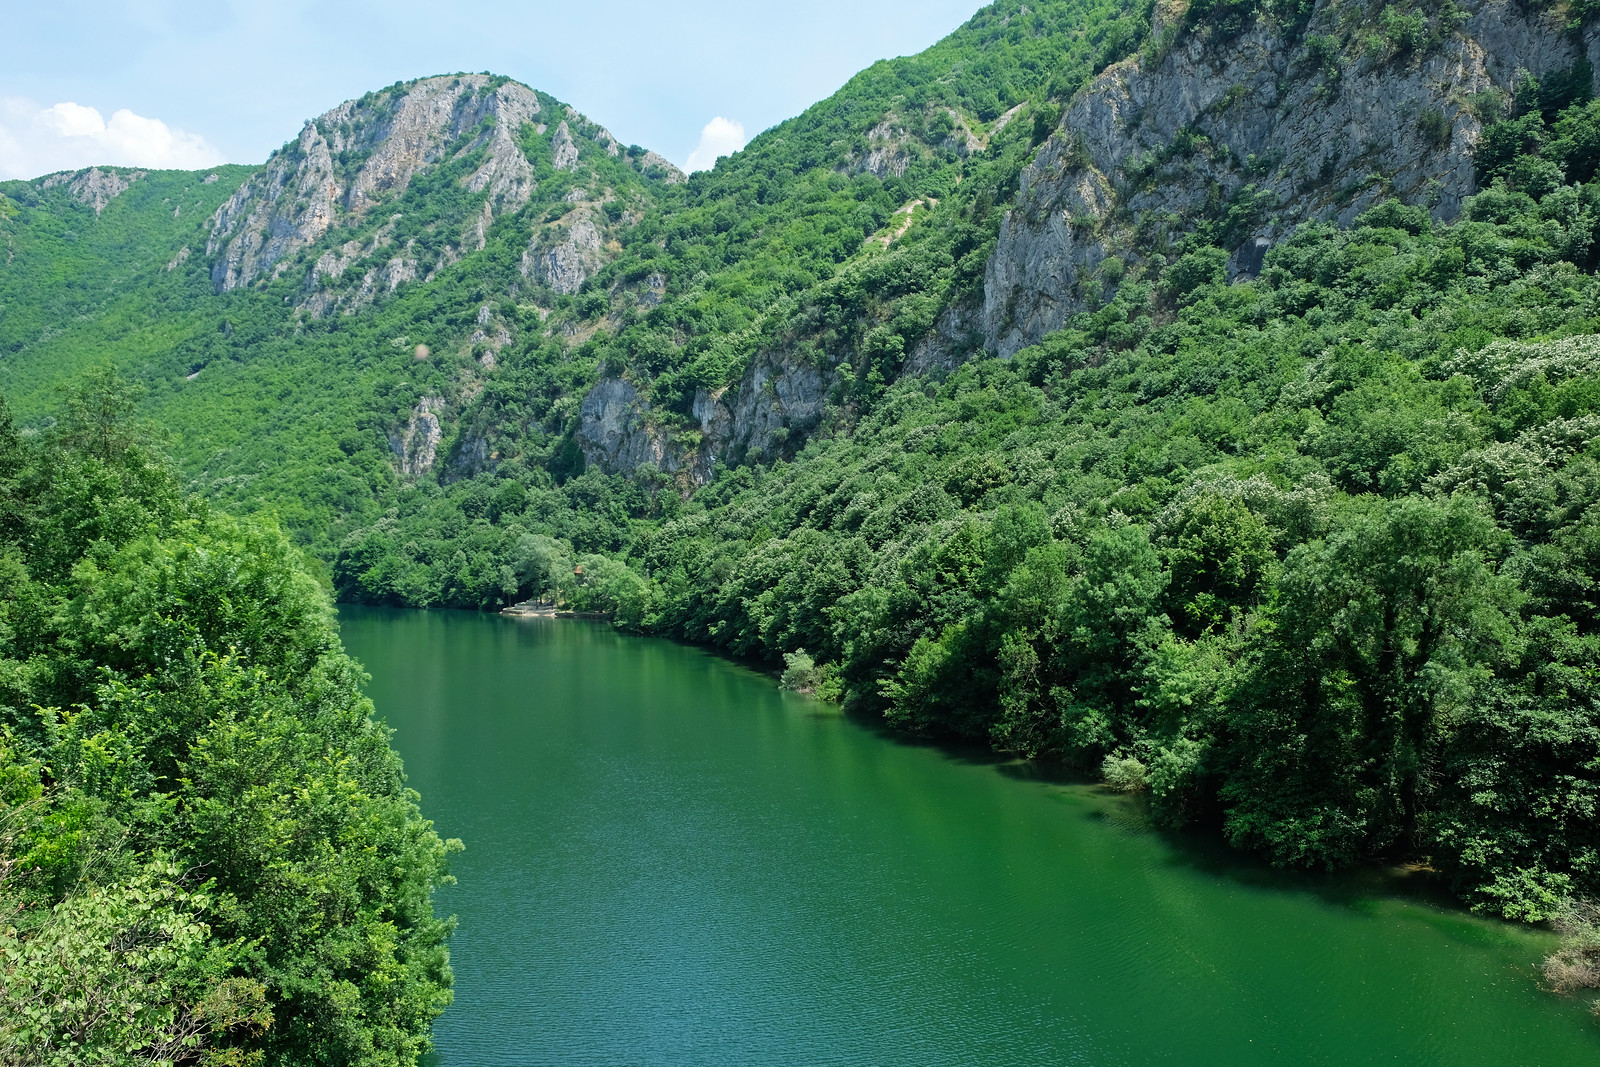 Matka Canyon, Jasen Nature Reserve, North Macedonia